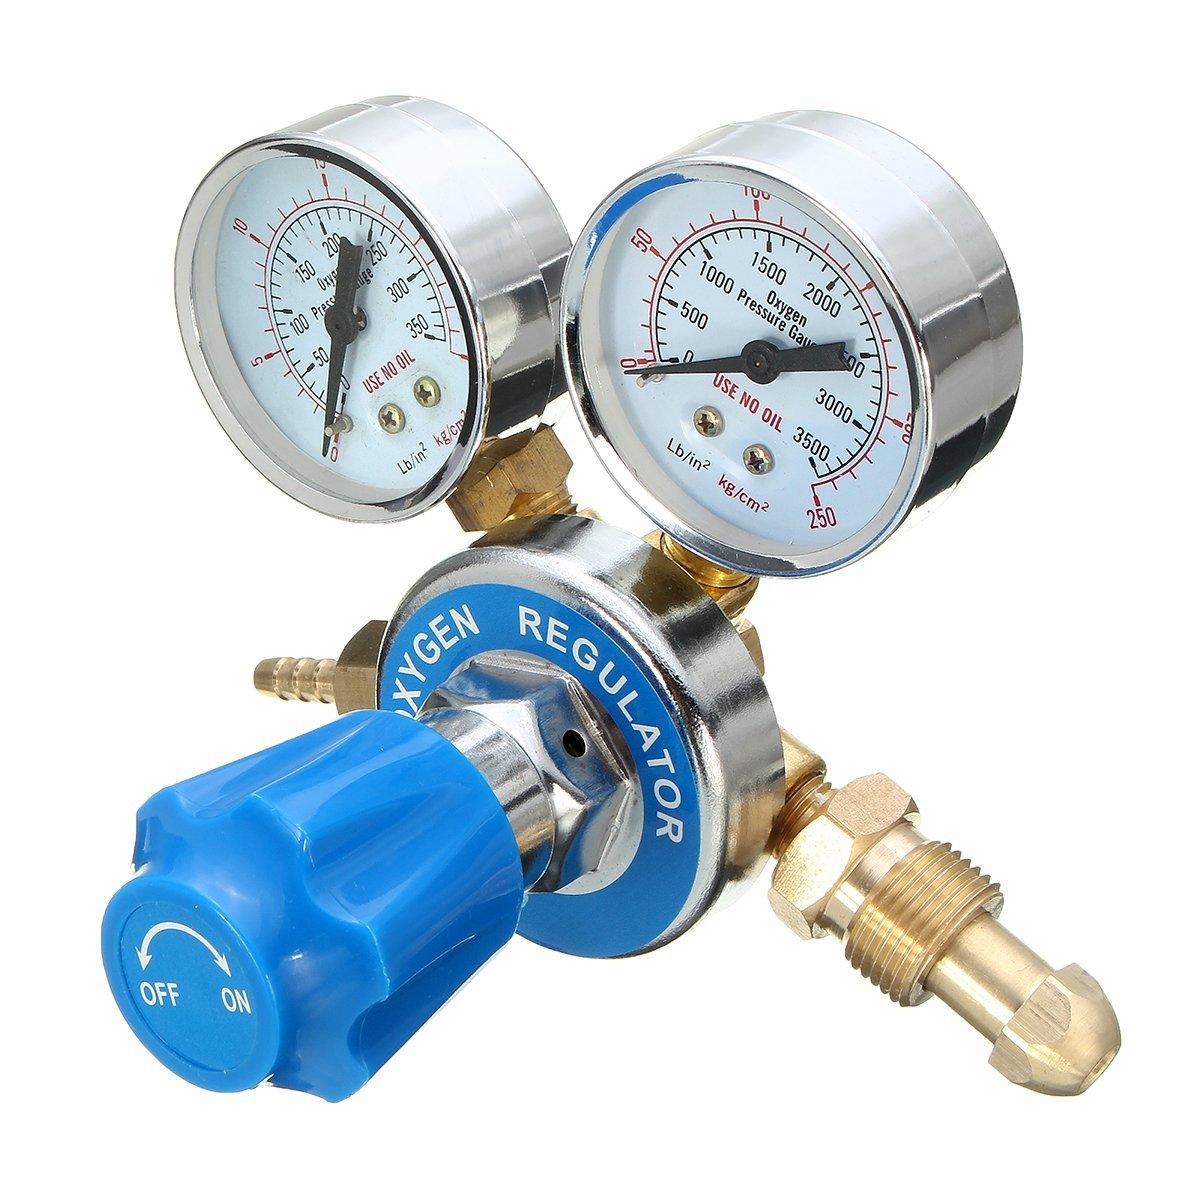 Smith Little Torch 23-1001D American Fitting Gentec Regulator Gas /& Oxygen Combo